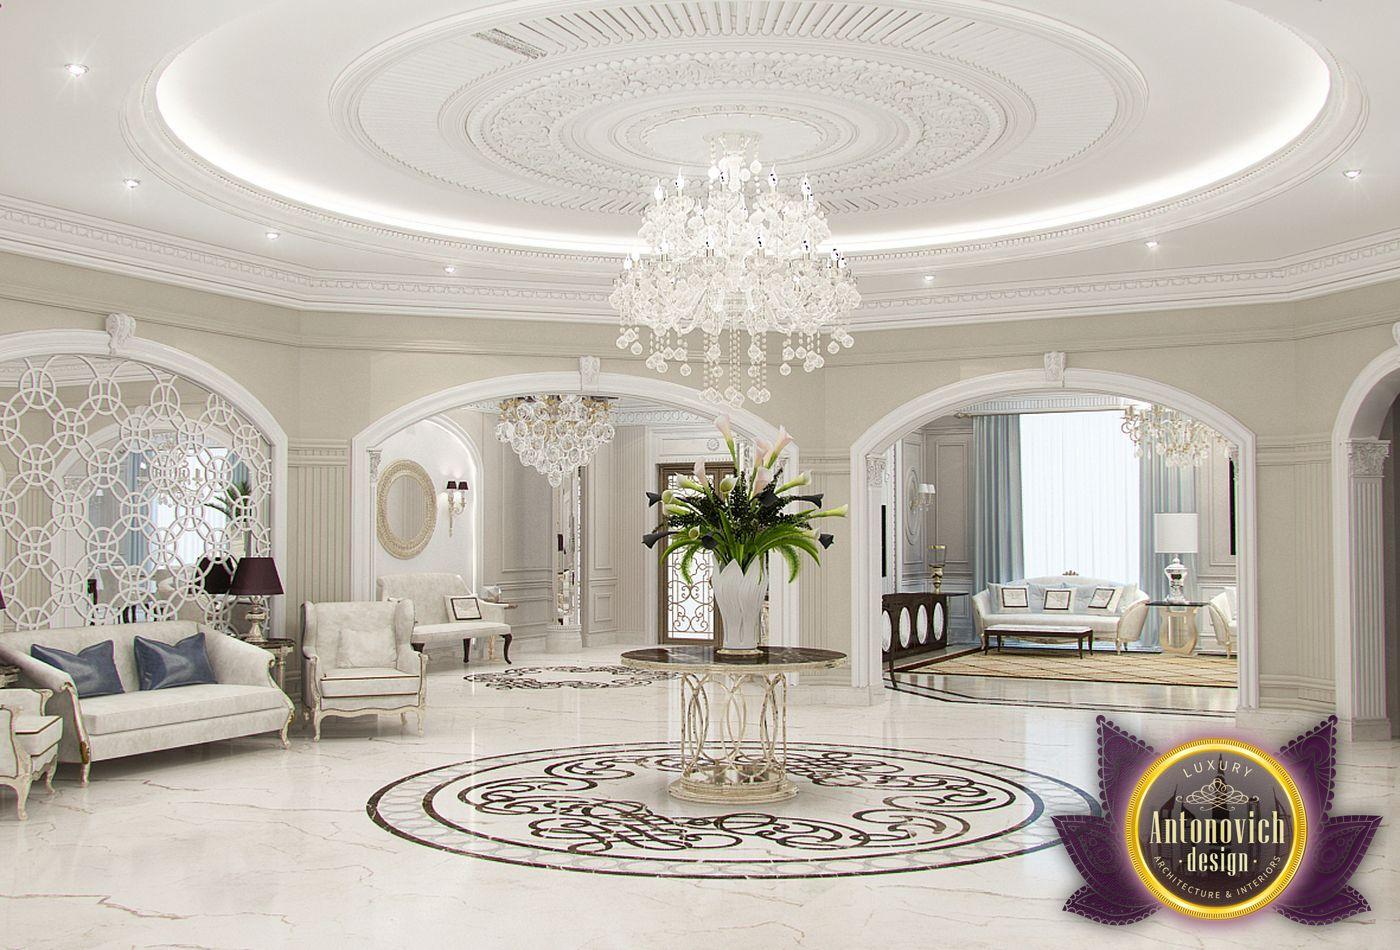 Foyer Decor Uae : Luxury antonovich design uae Дизайн виллы от Екатерины